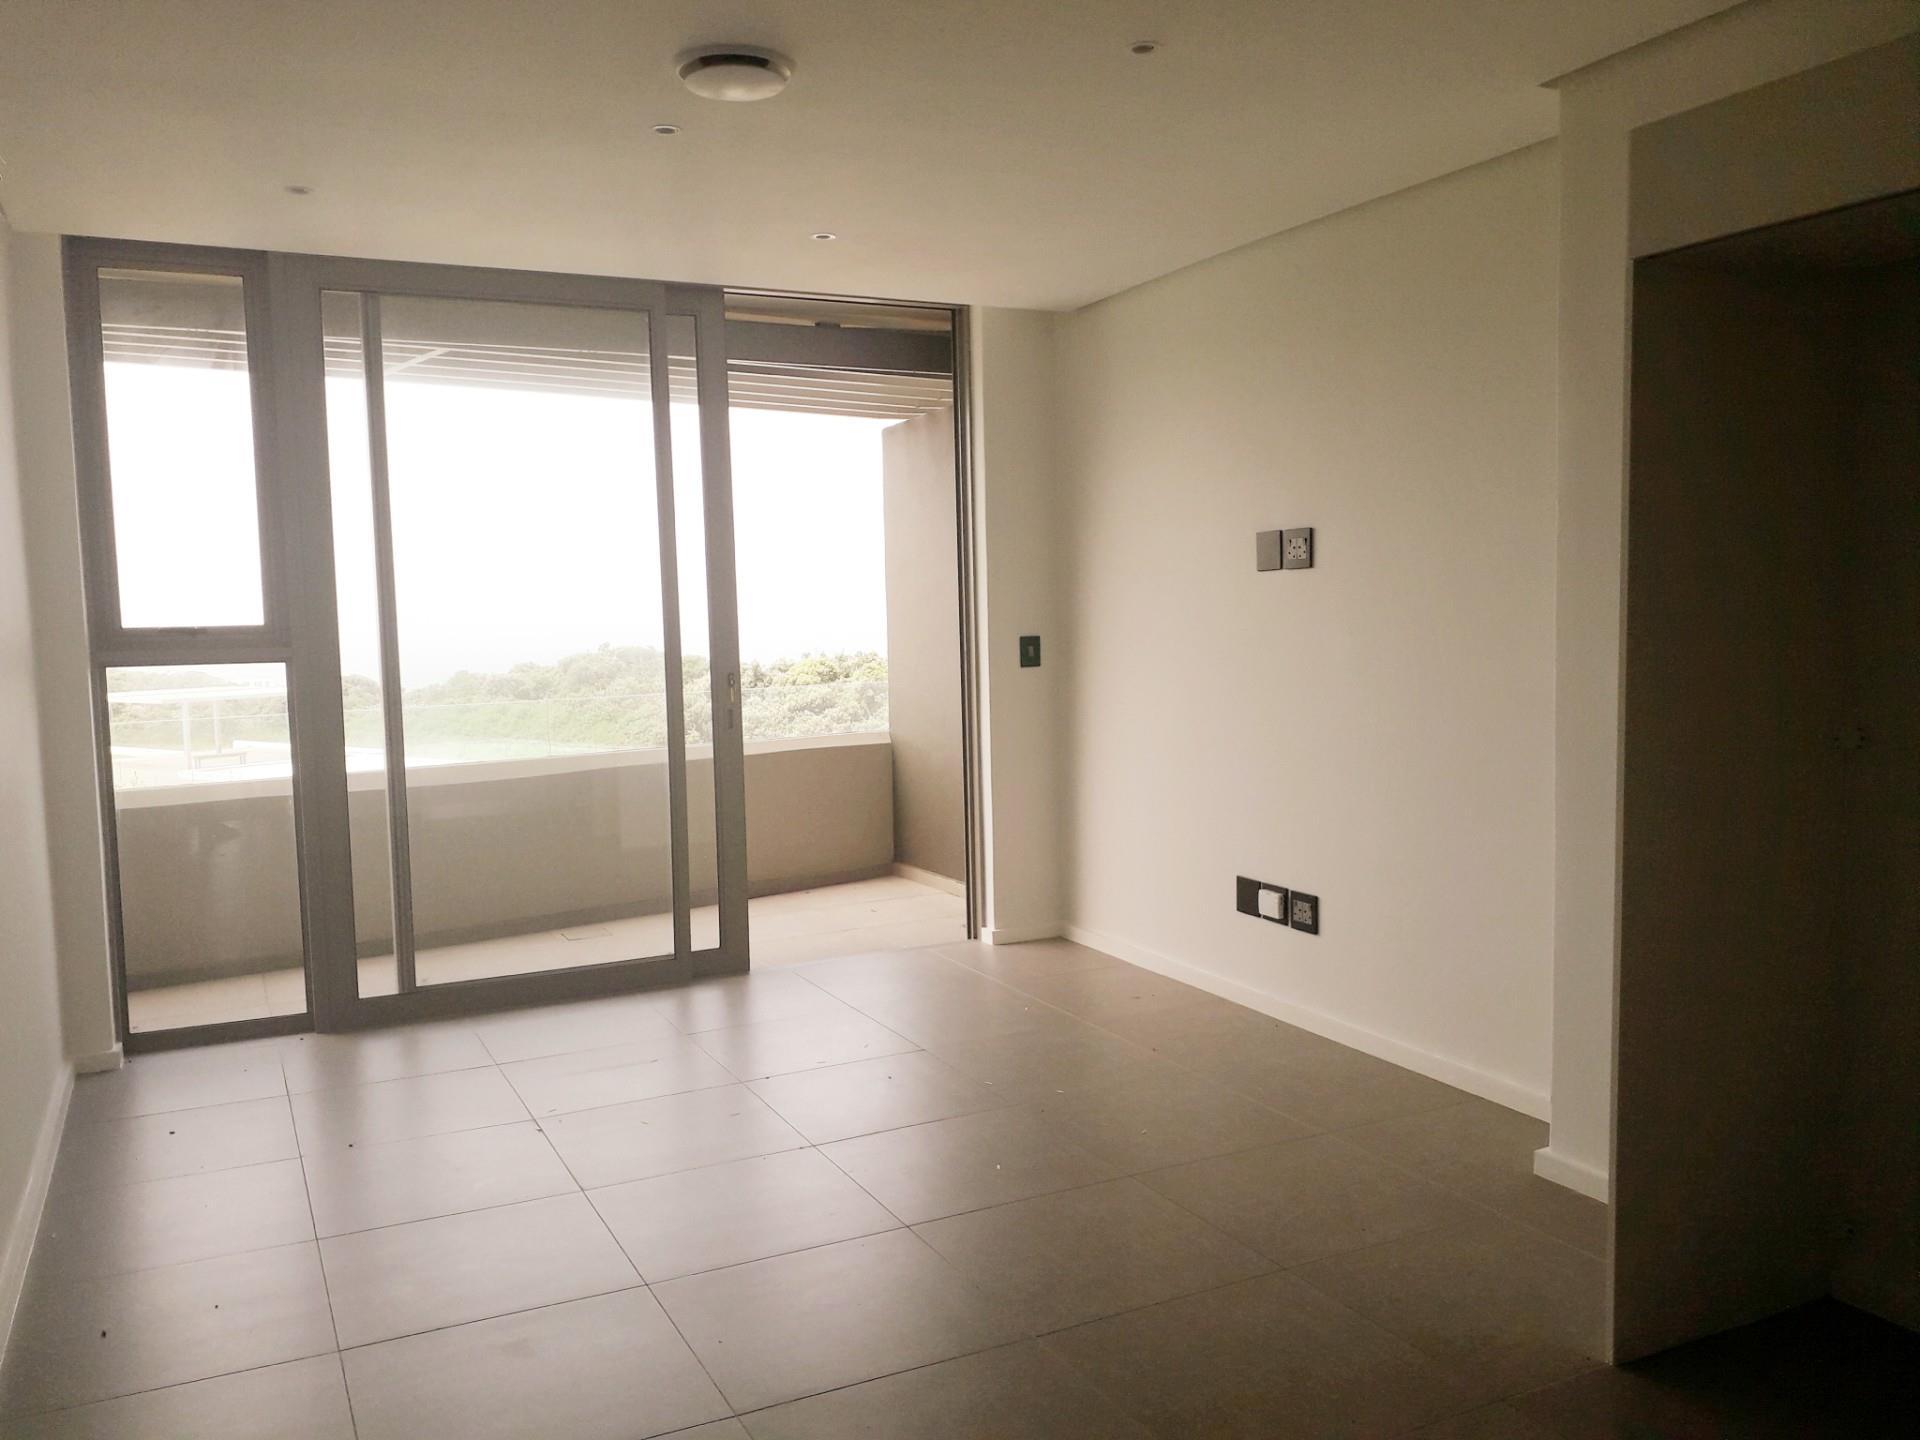 2 Bedroom Apartment / Flat To Rent in Sibaya Precinct